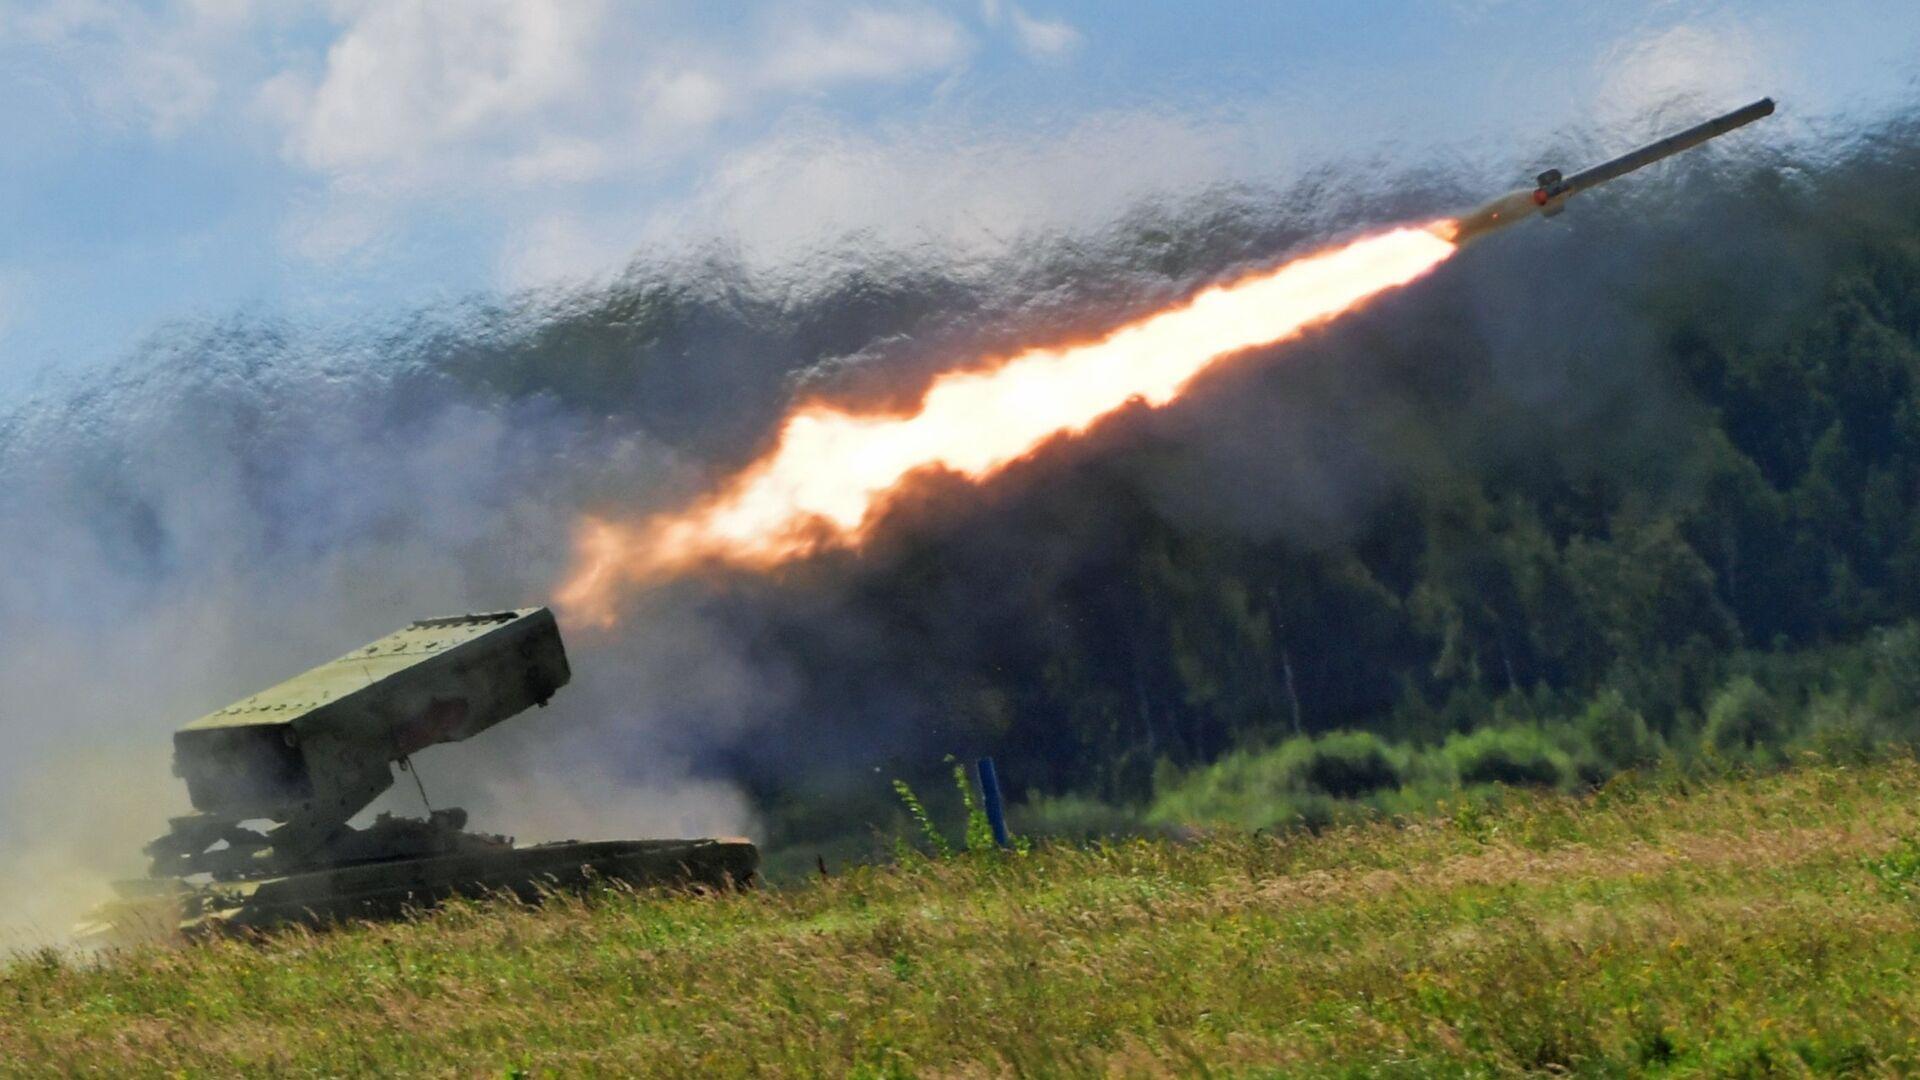 Тяжелая огнеметная система залпового огня на базе танка Т-72 ТОС-1 Буратино на форуме Армия-2018. 22 августа 2018 - РИА Новости, 1920, 13.11.2020